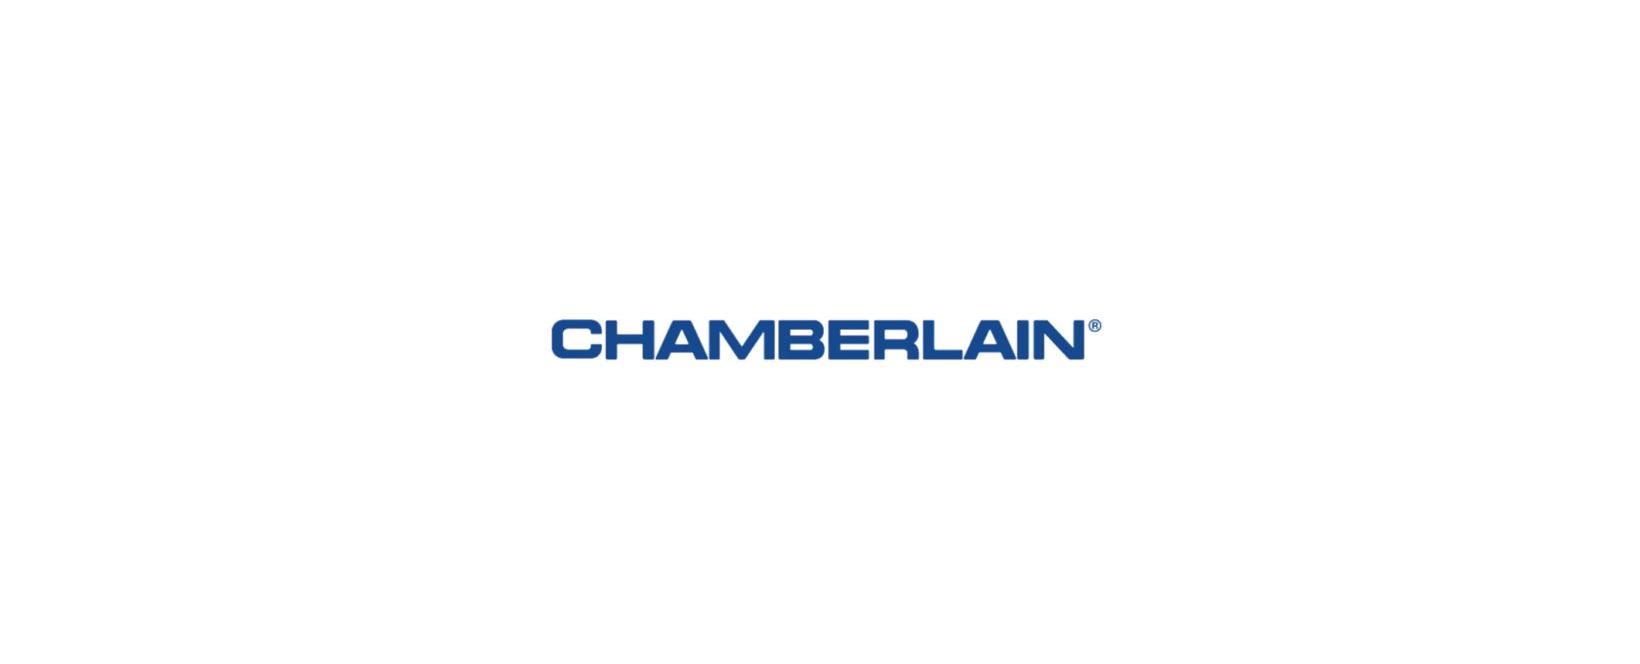 Chamberlain Coupon Code 2021